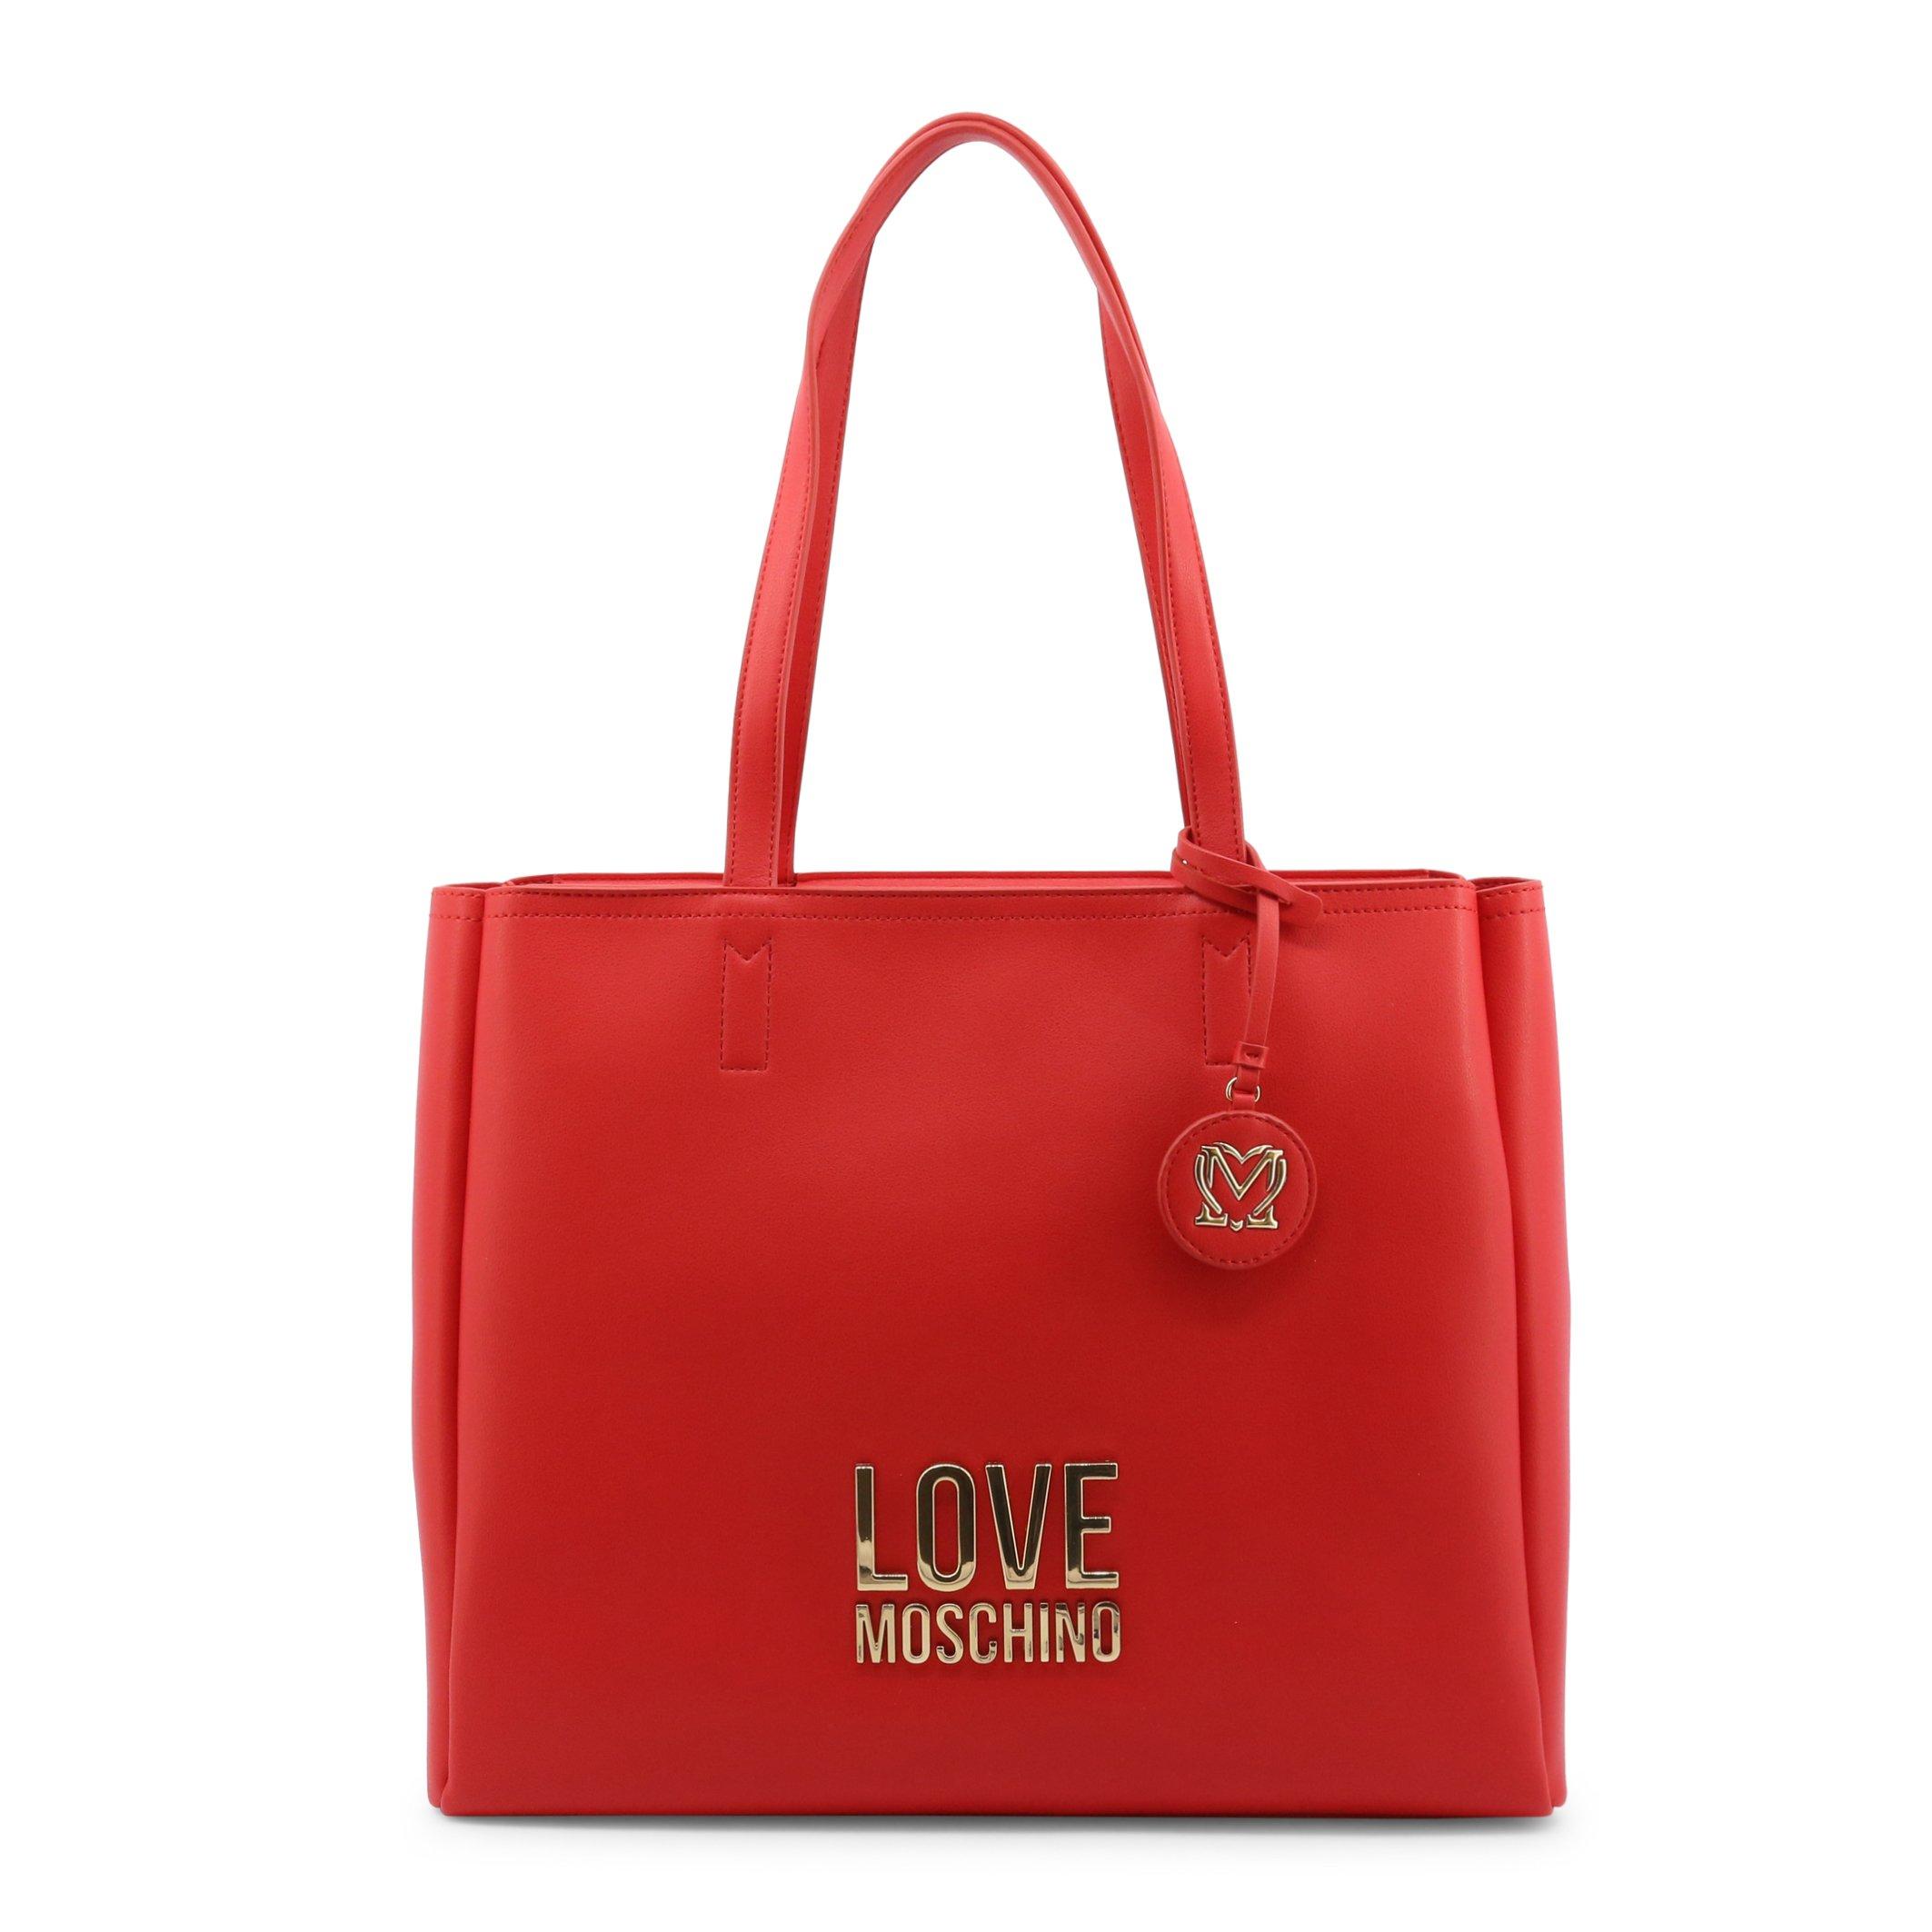 Love Moschino Women's Shopping Bag Various Colours JC4100PP1DLJ0 - red NOSIZE